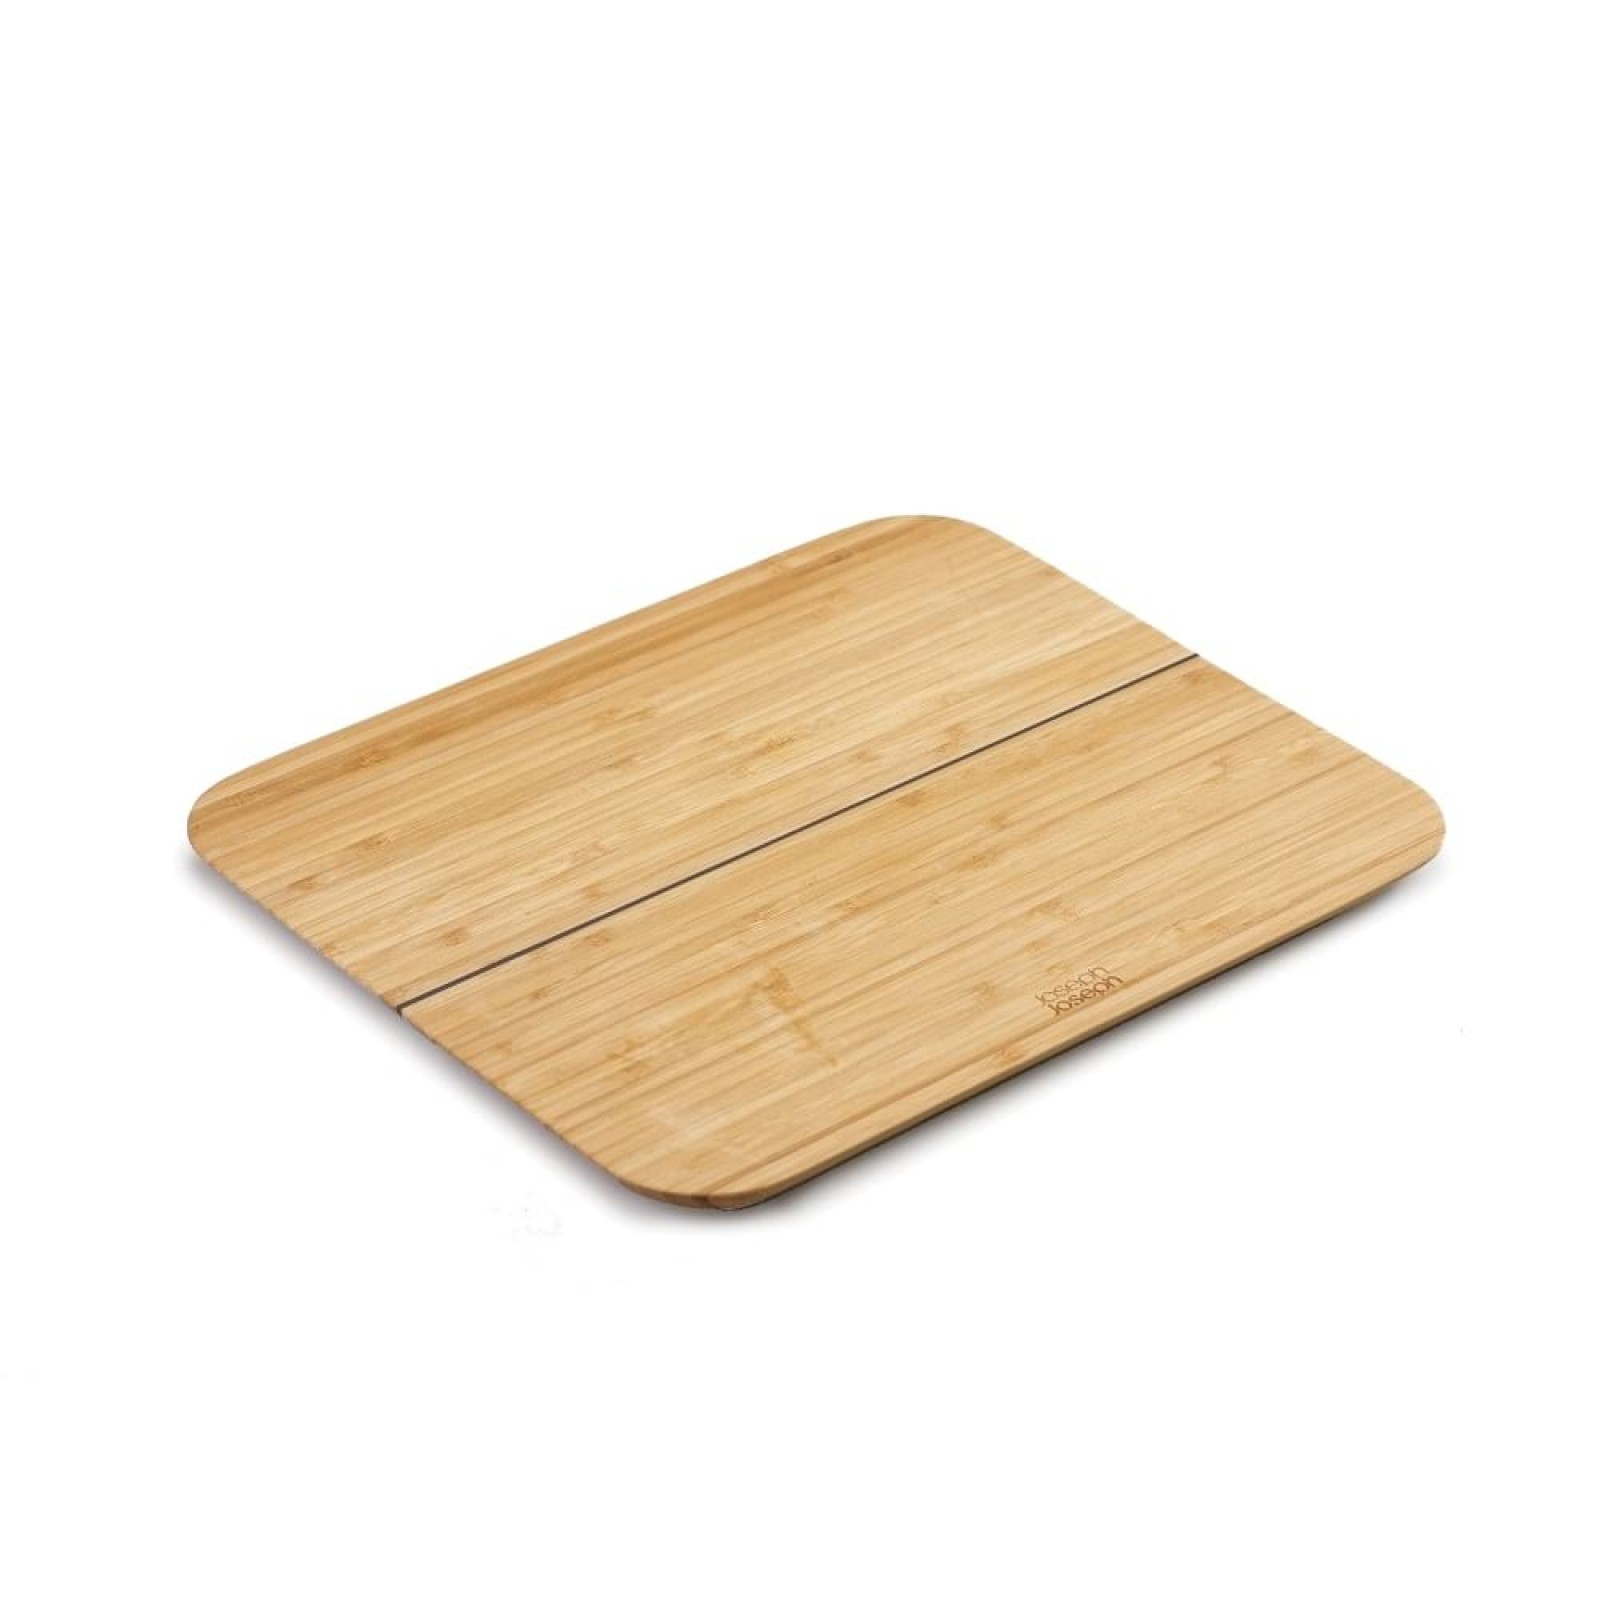 Chop2Pot™ Bamboo Folding Chopping Board (Large) - Joseph Joseph